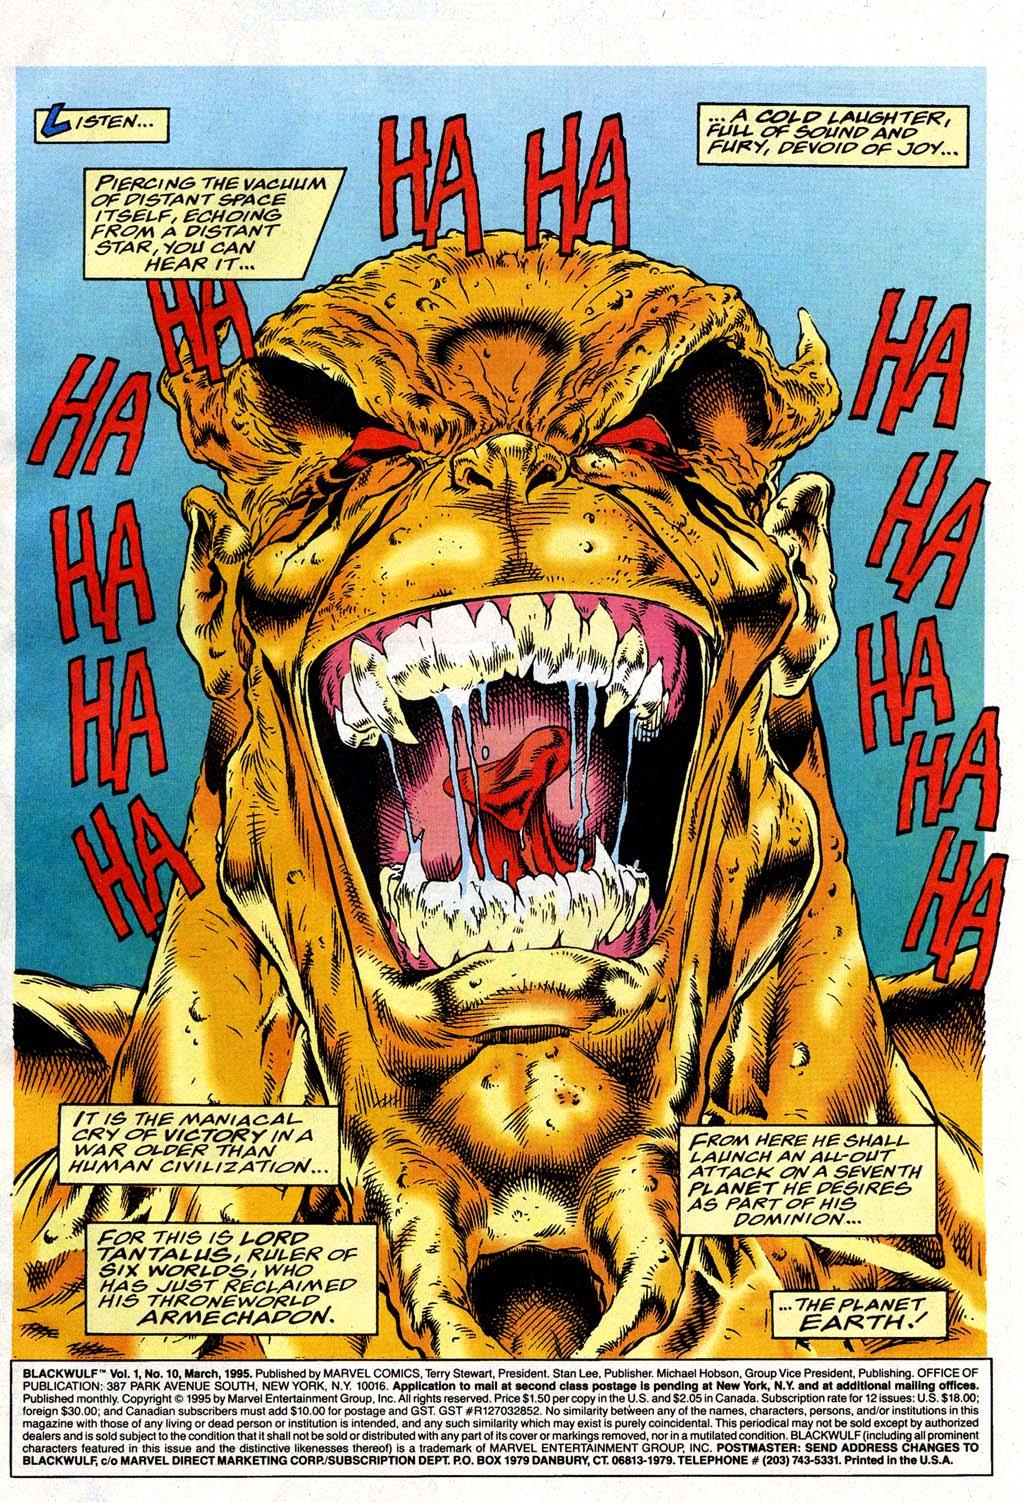 Read online Blackwulf comic -  Issue #10 - 2